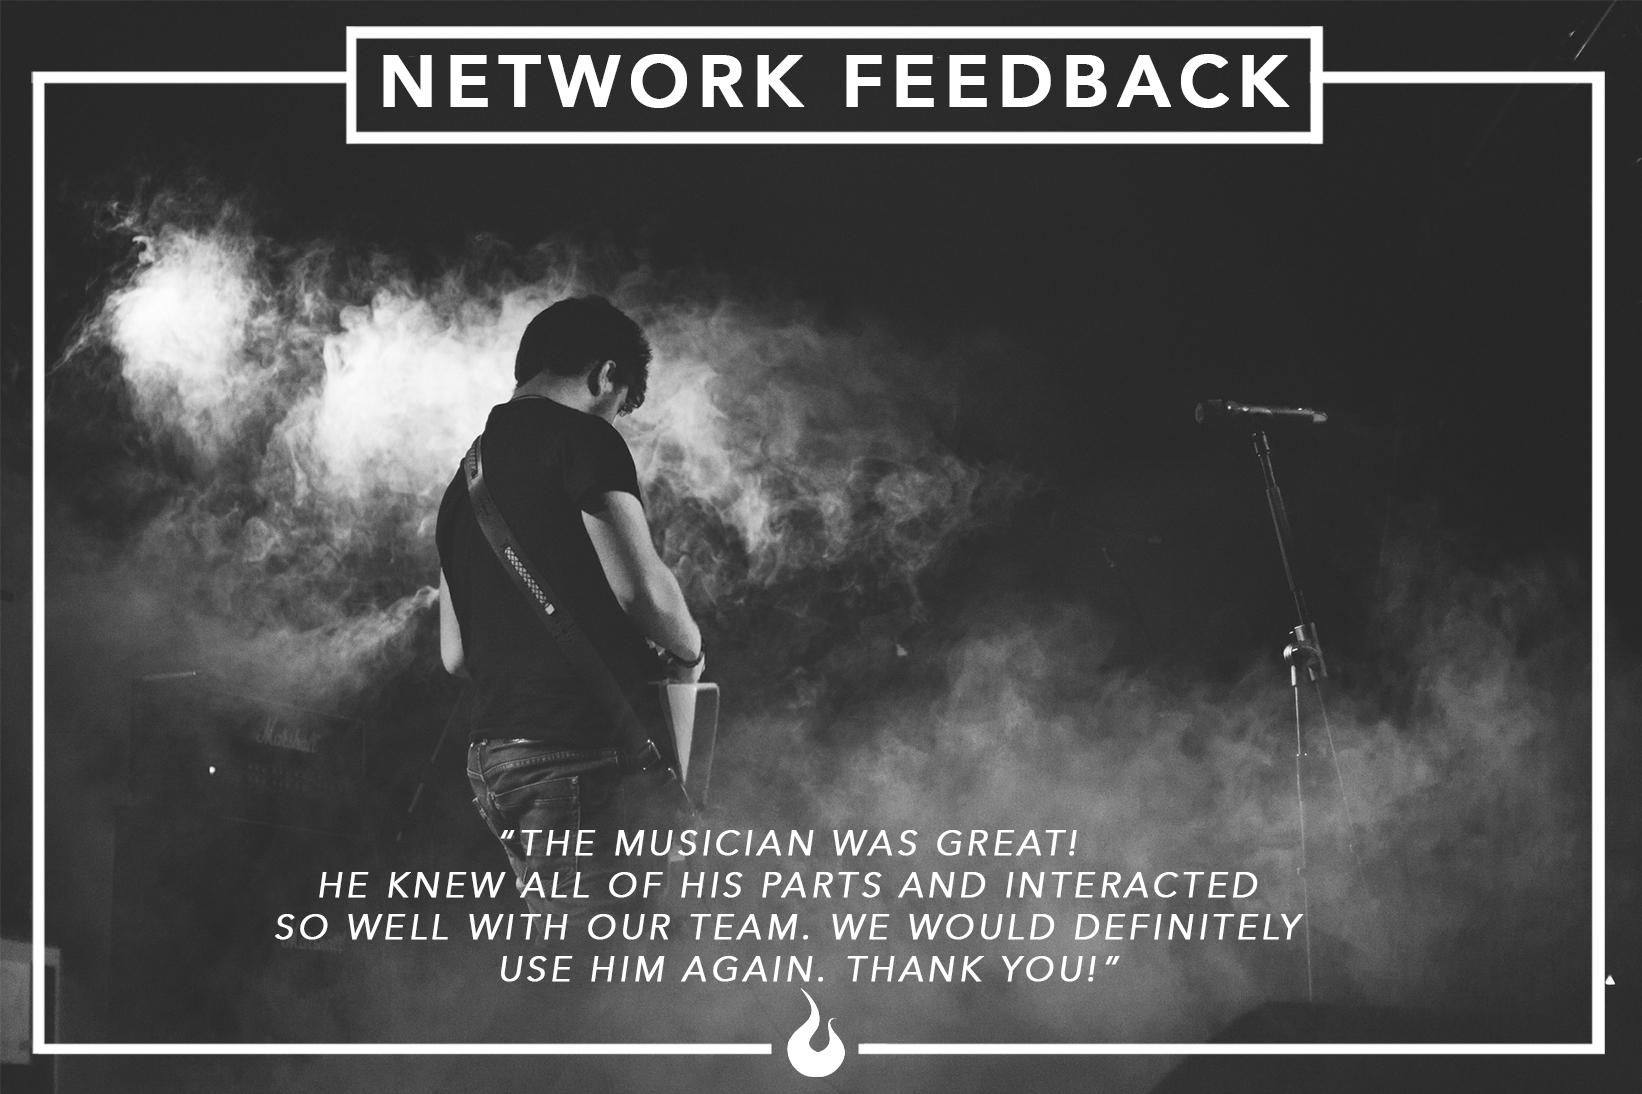 network feedback mock up.jpg